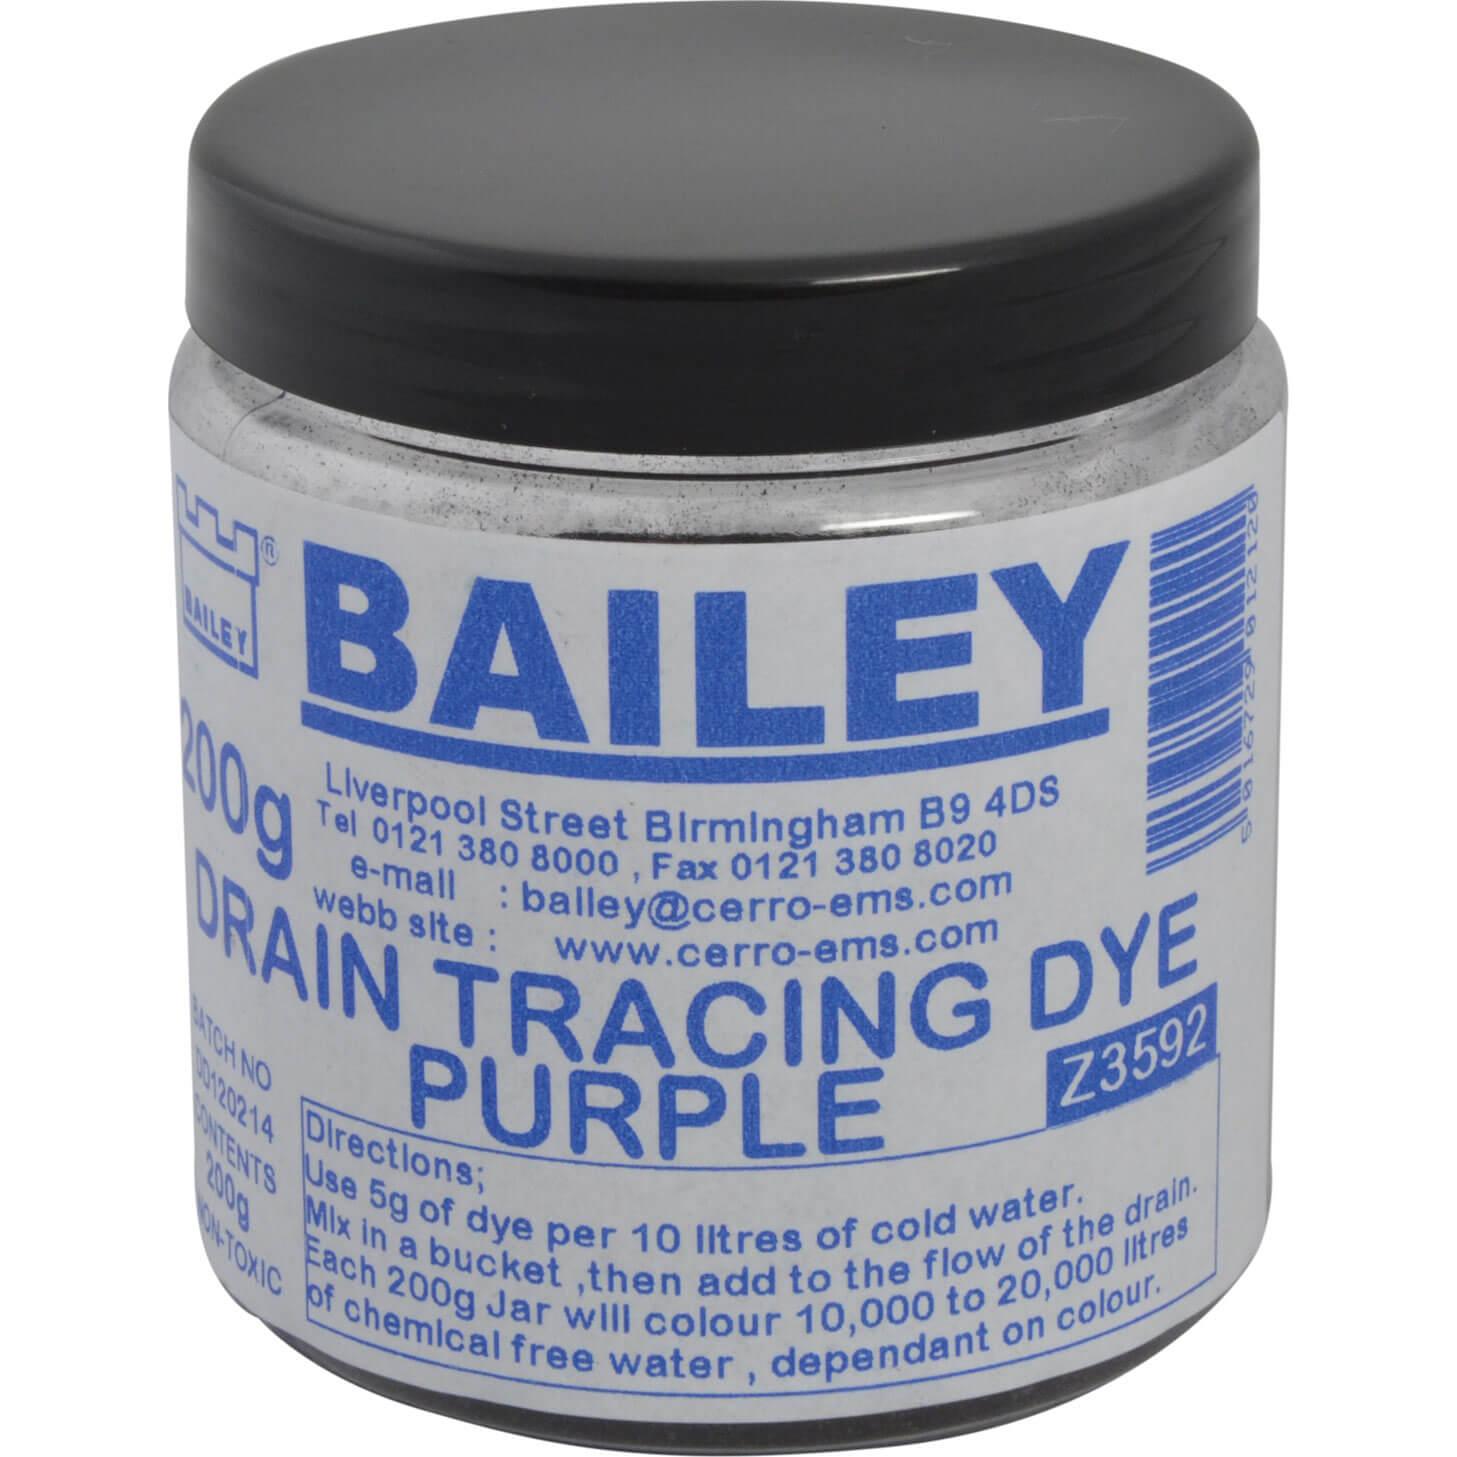 Bailey Drain Tracing Dye Purple 200g